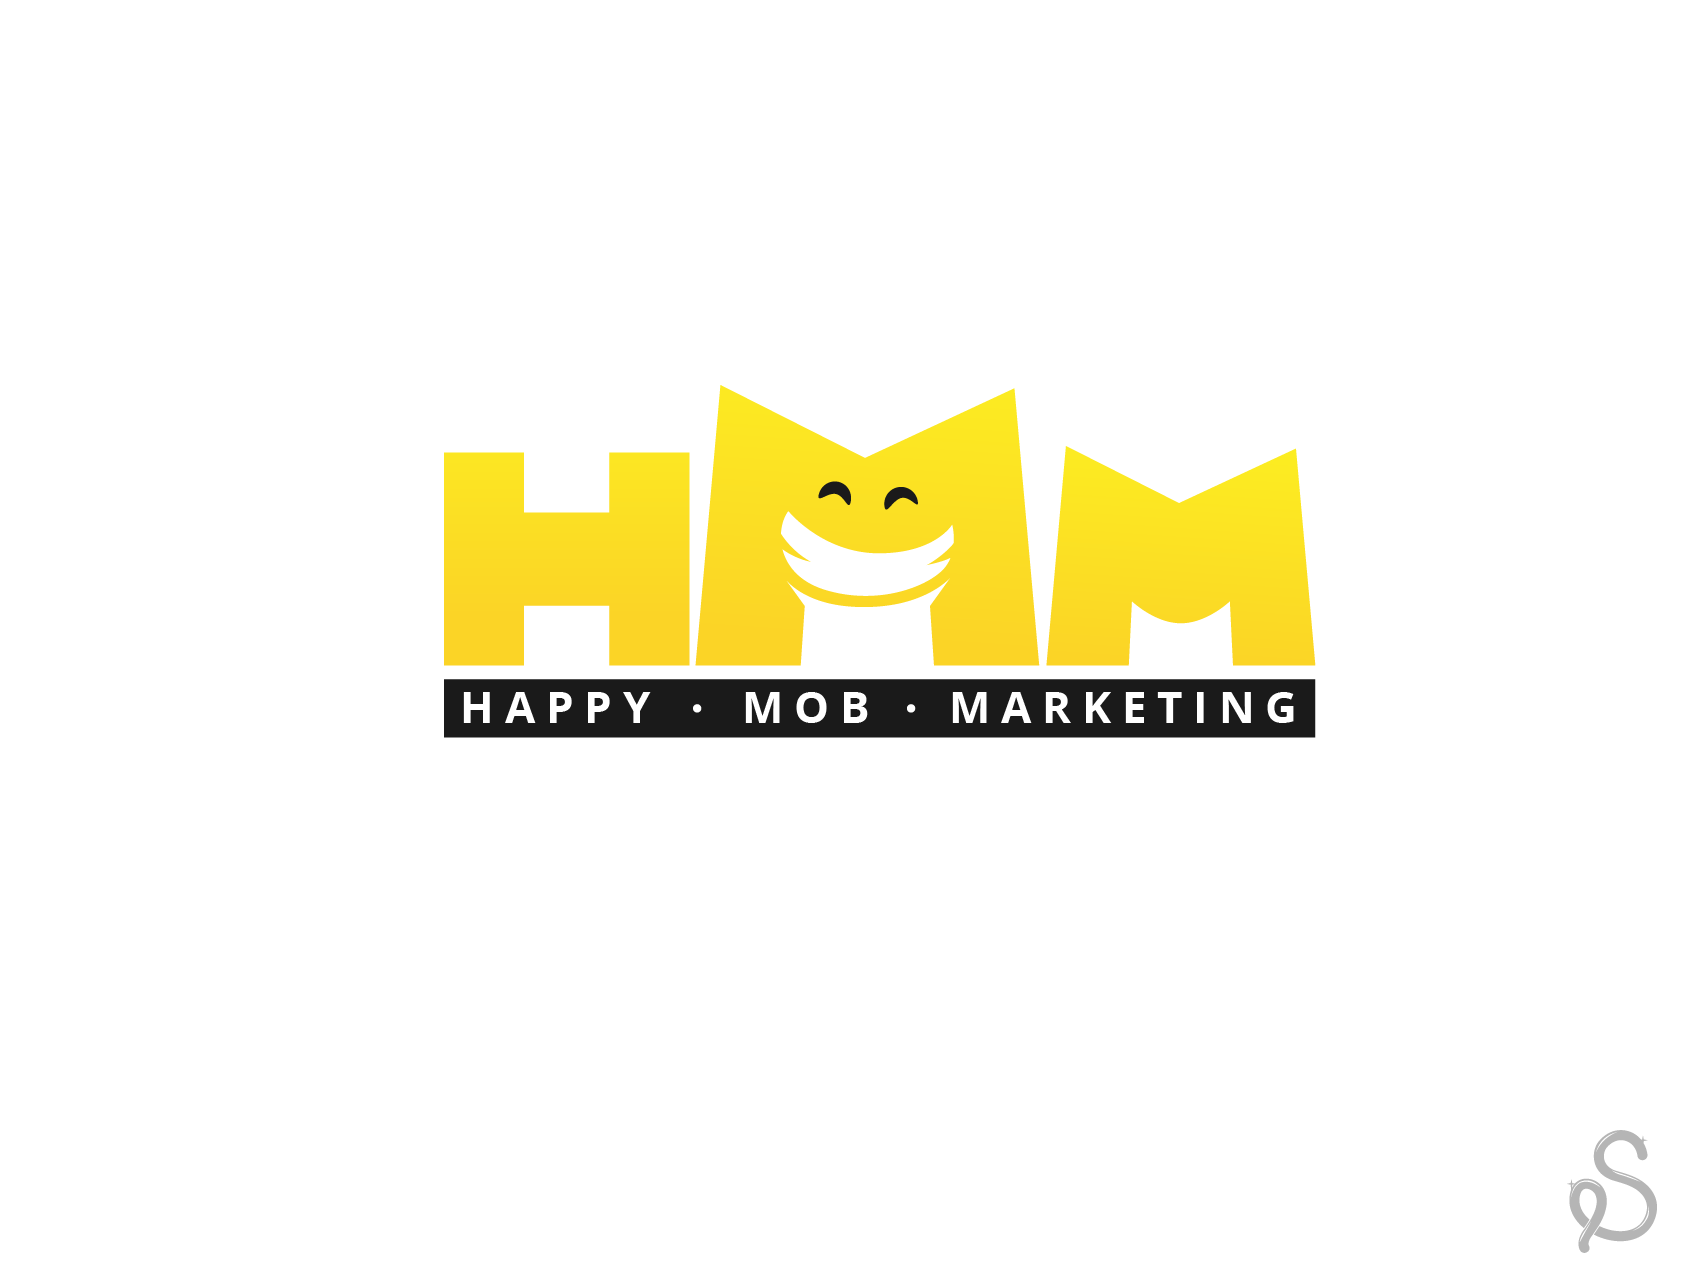 Happy Mob Marketing needs a new logo